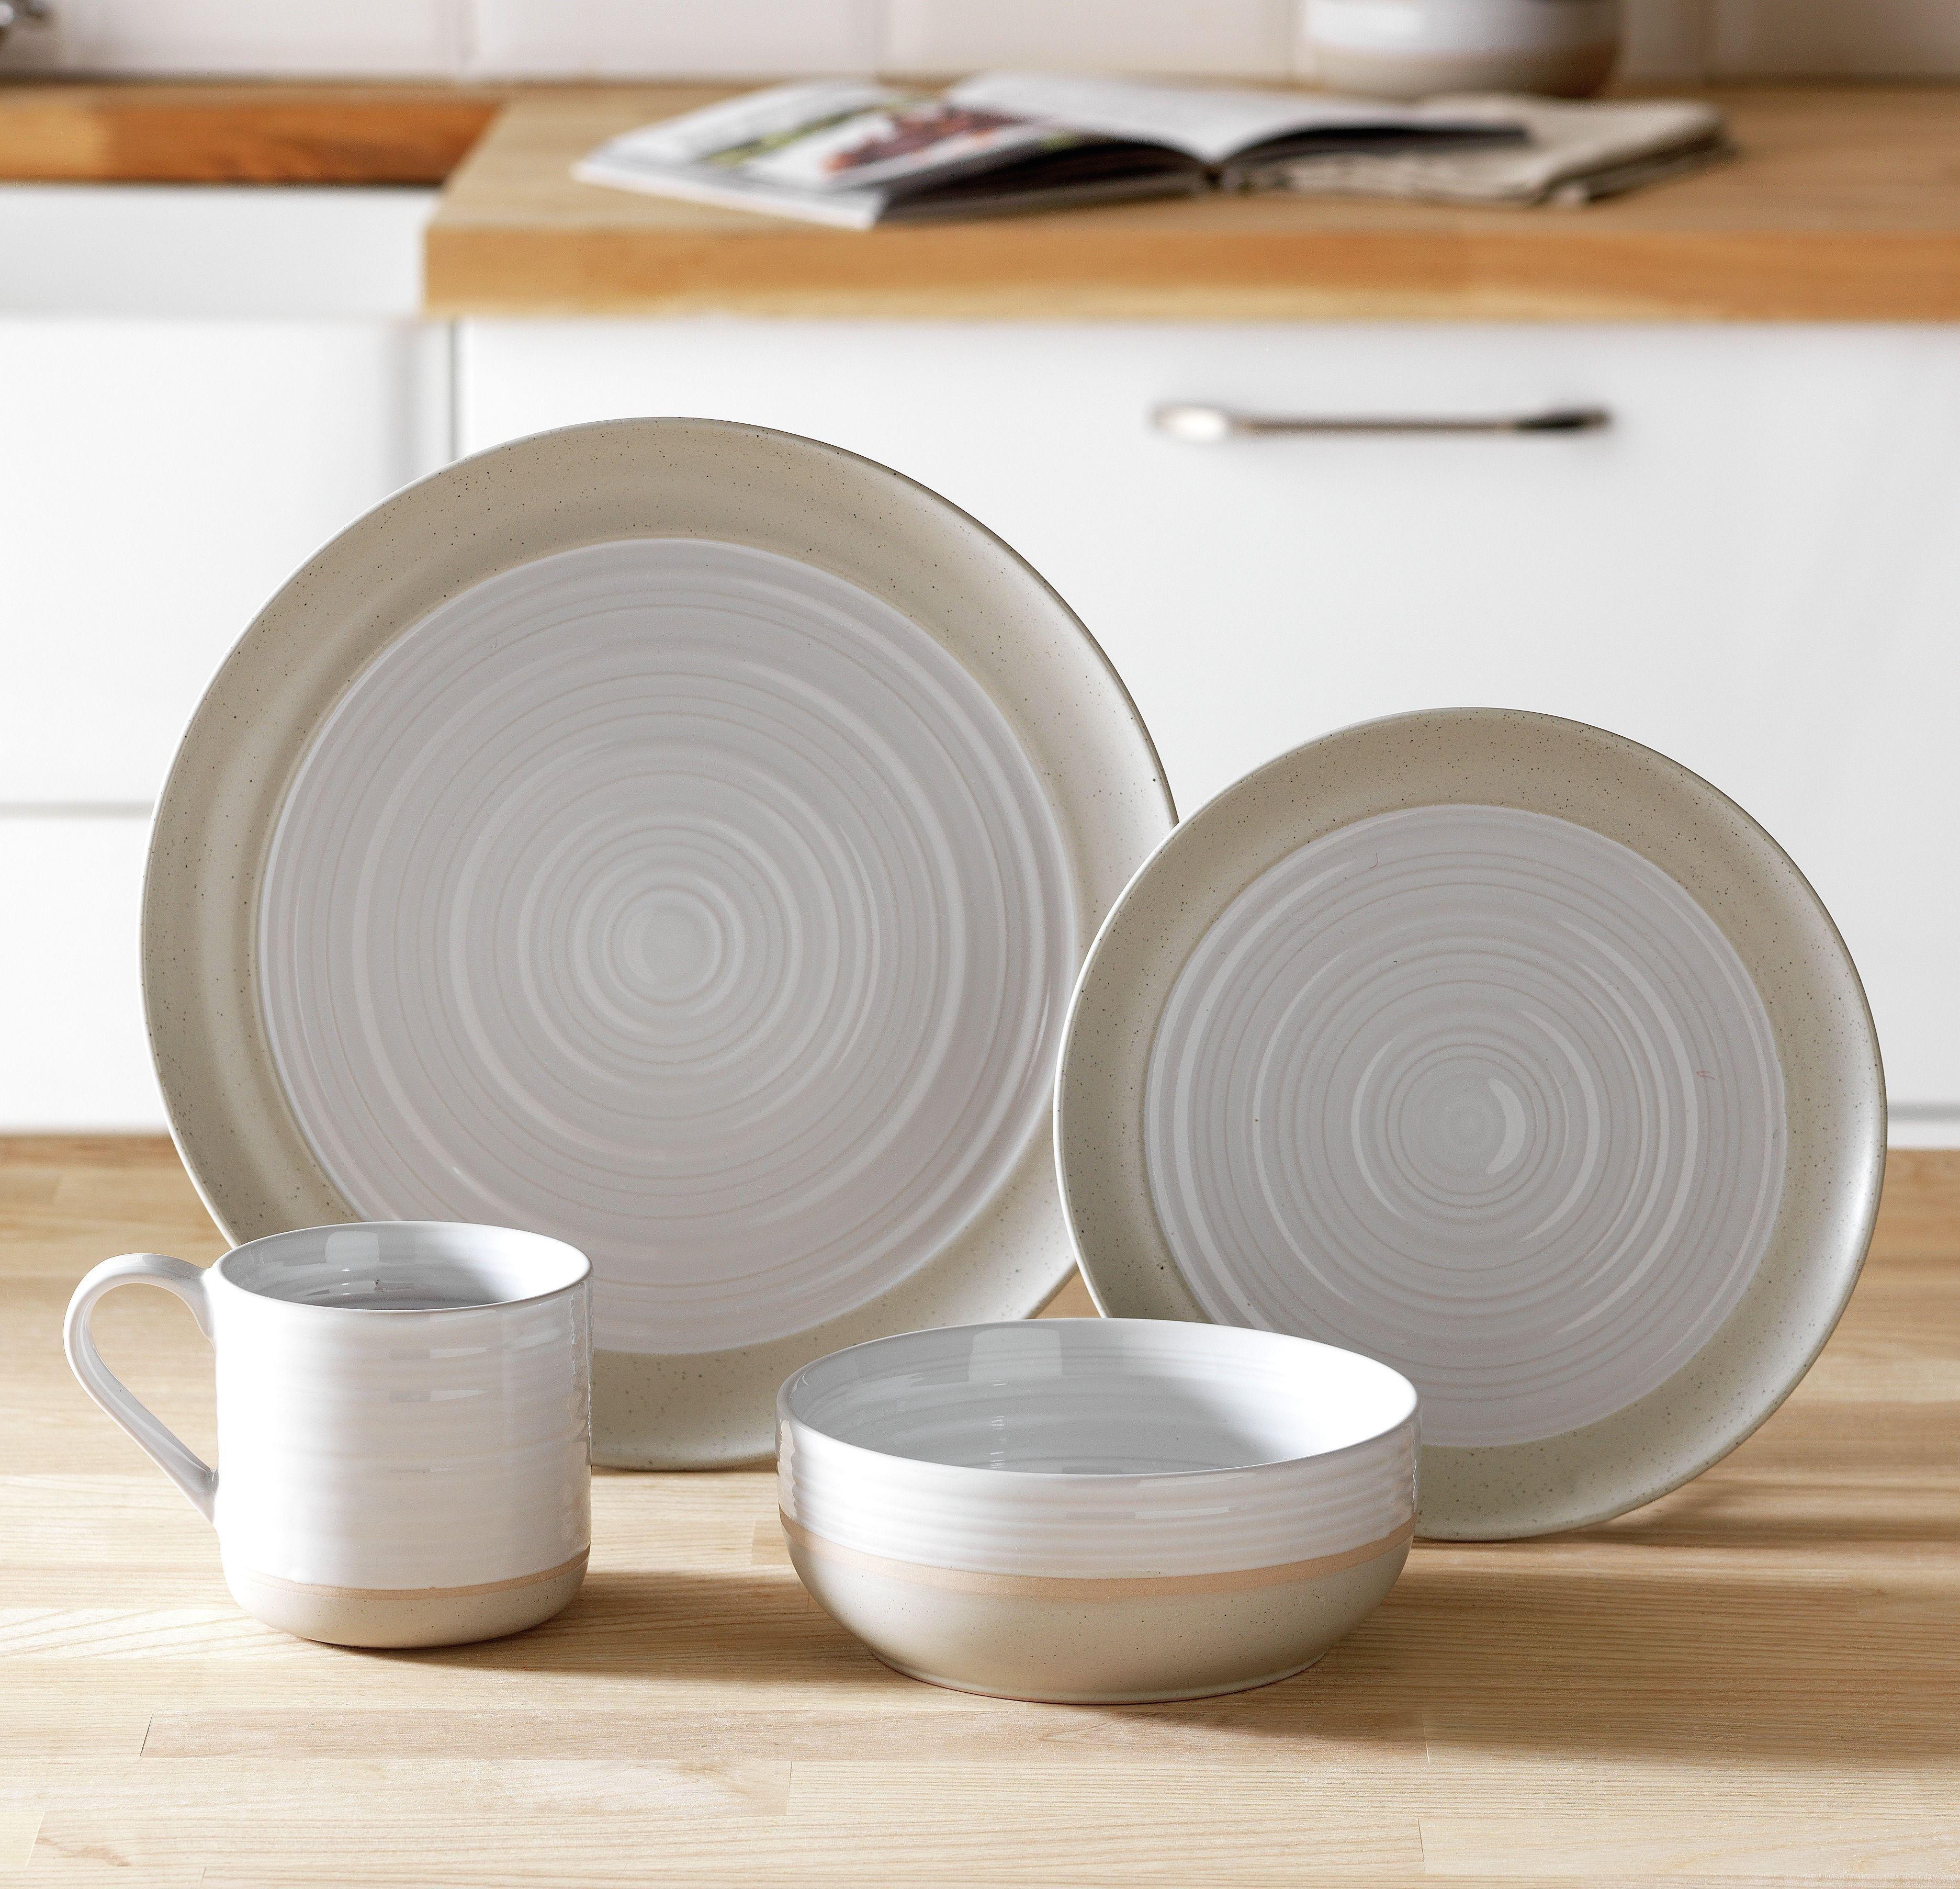 Heart of House - Purton 16 Piece Stoneware Dinner Set - White